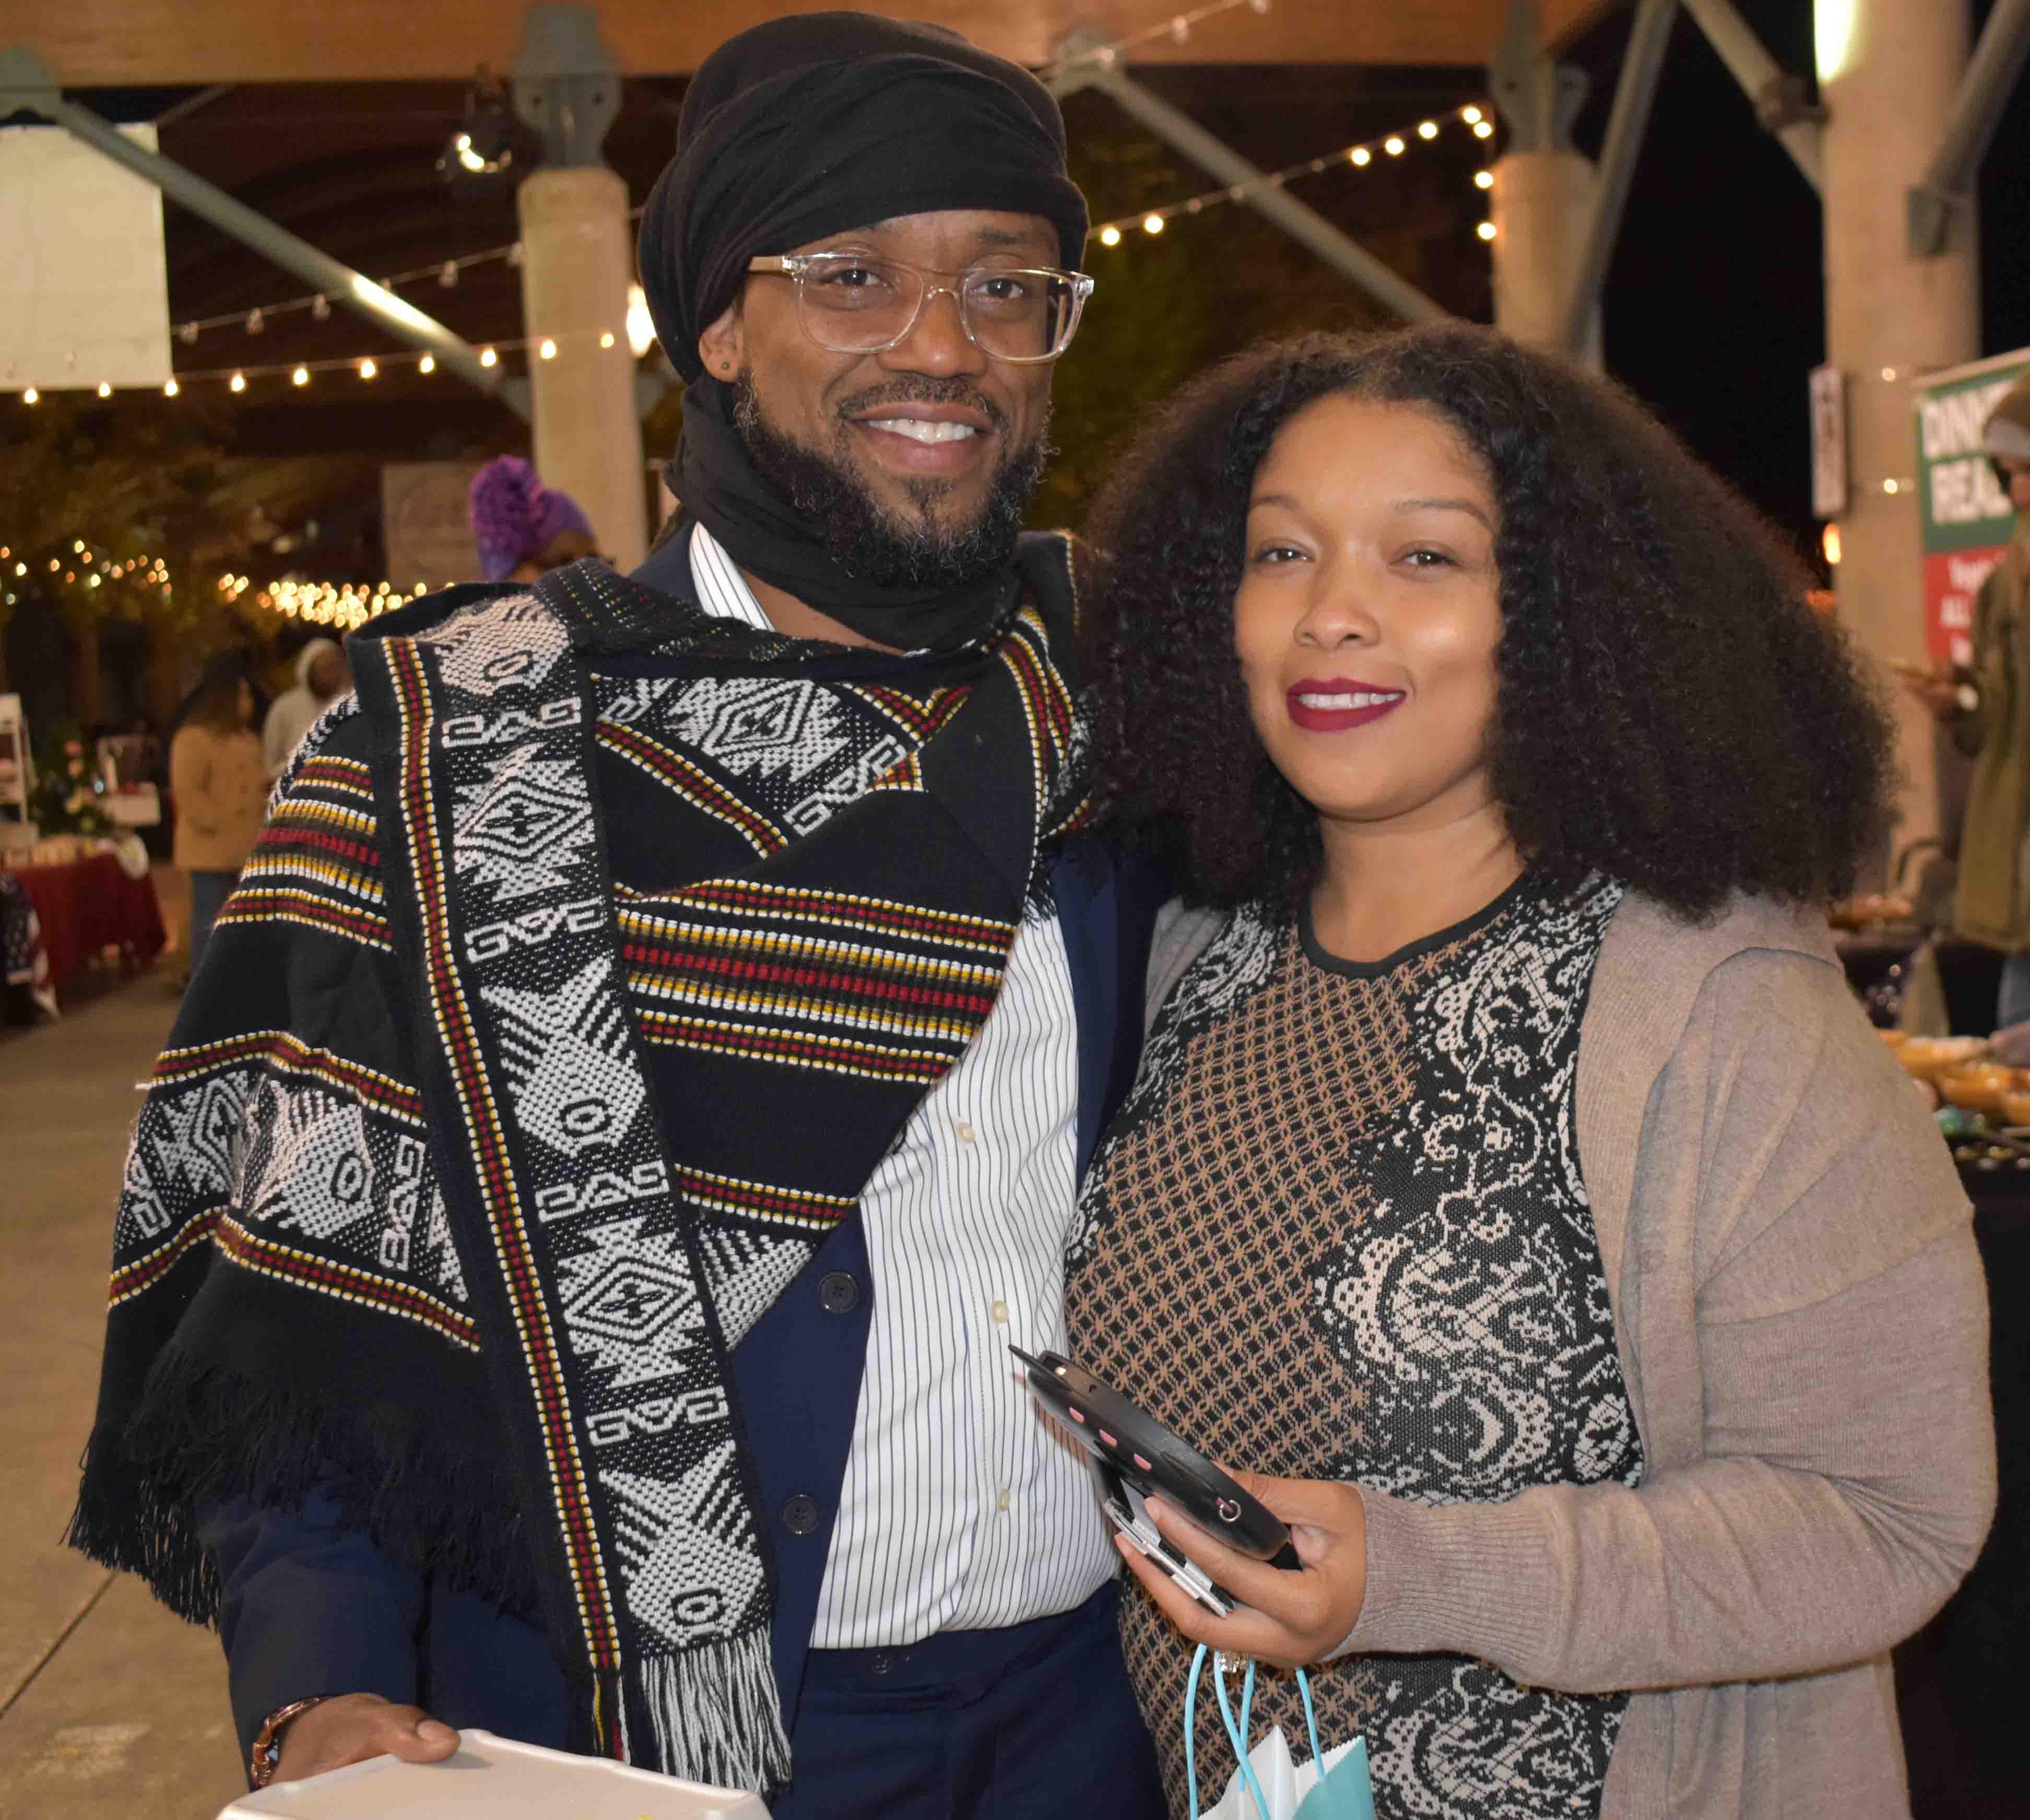 Marashal and Ebony Charles